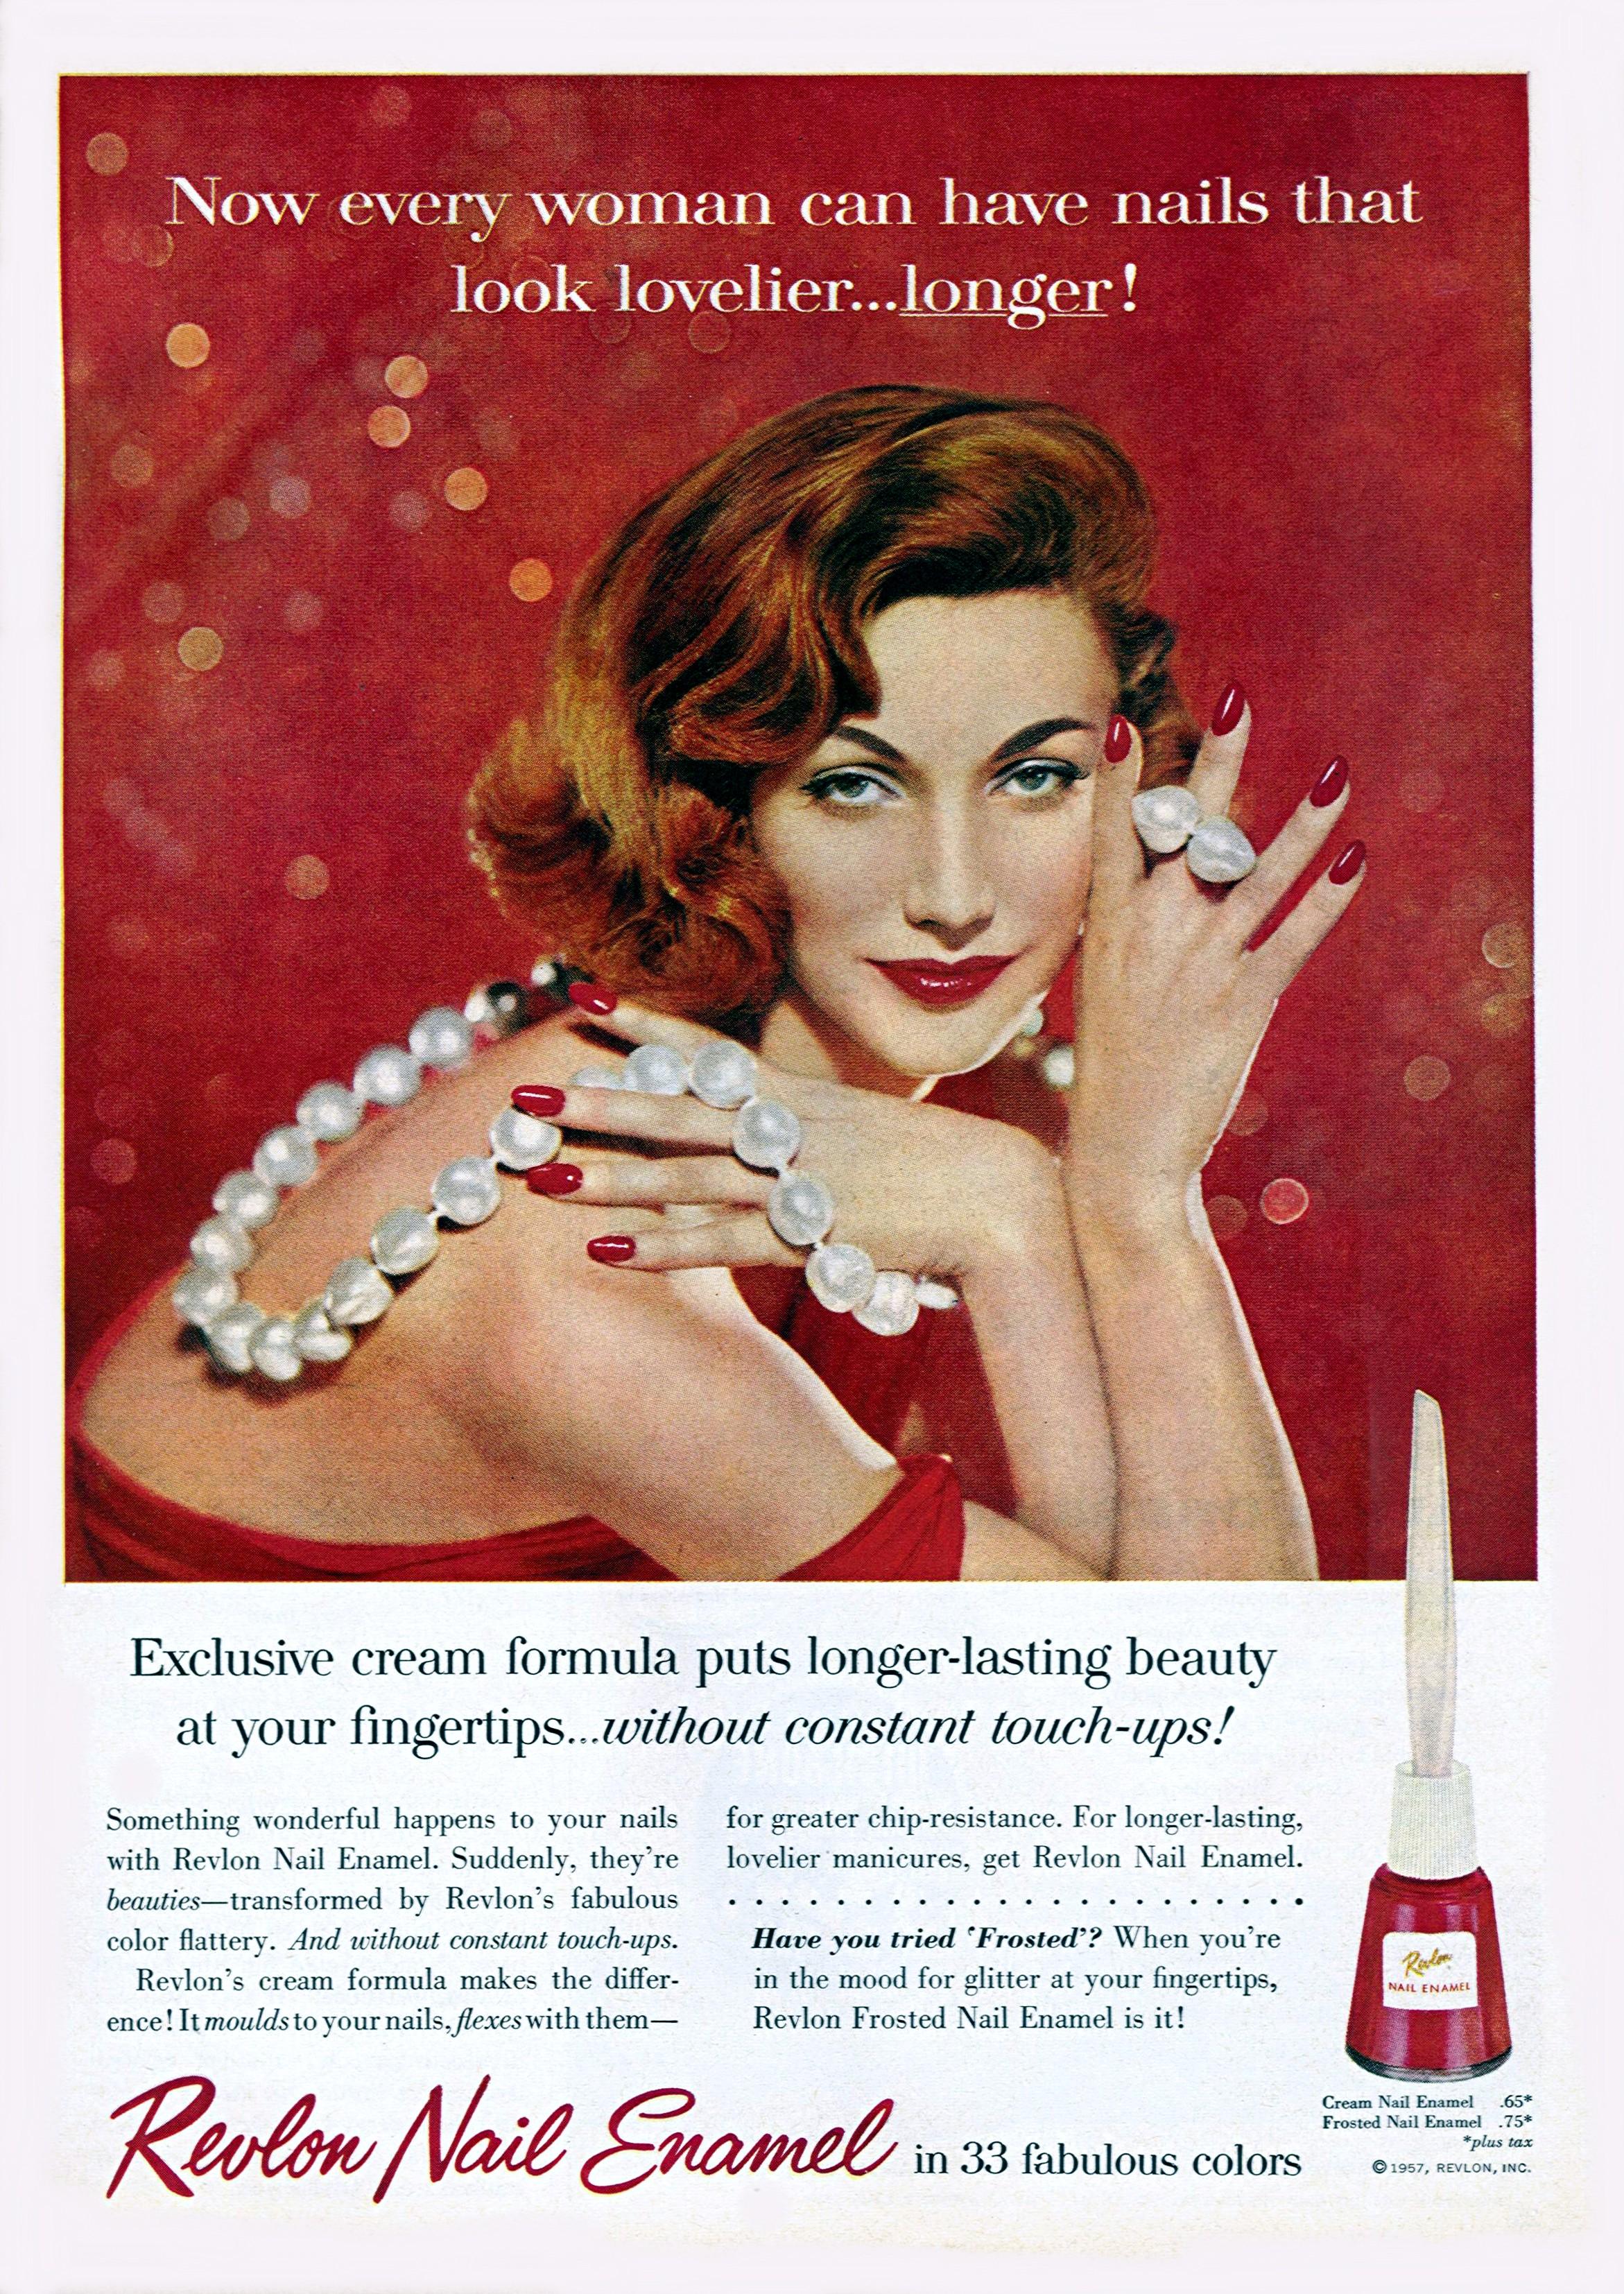 Revlon Nail Enamel - published in Good Housekeeping - May 1957